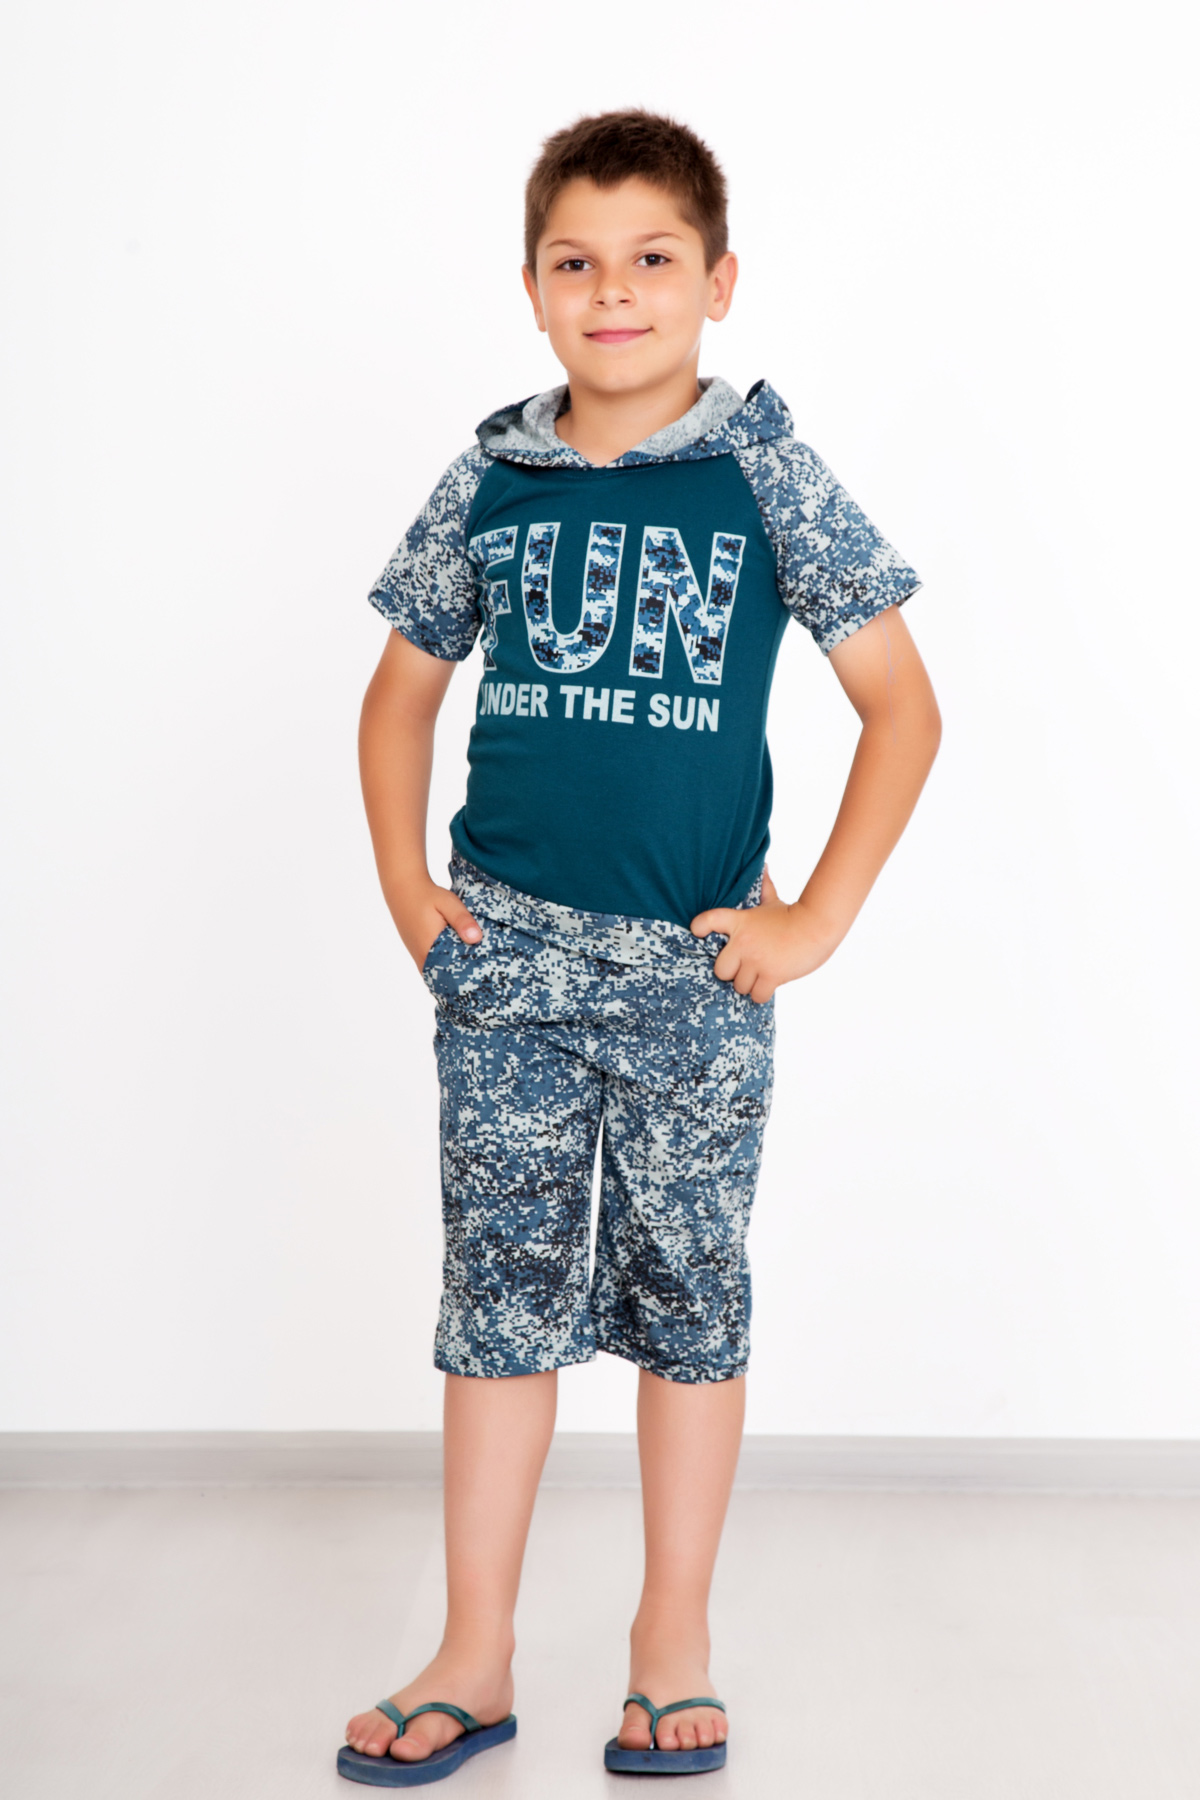 Дет. костюм Ким р. 28Костюмы<br><br><br>Тип: Дет. костюм<br>Размер: 28<br>Материал: Кулирка